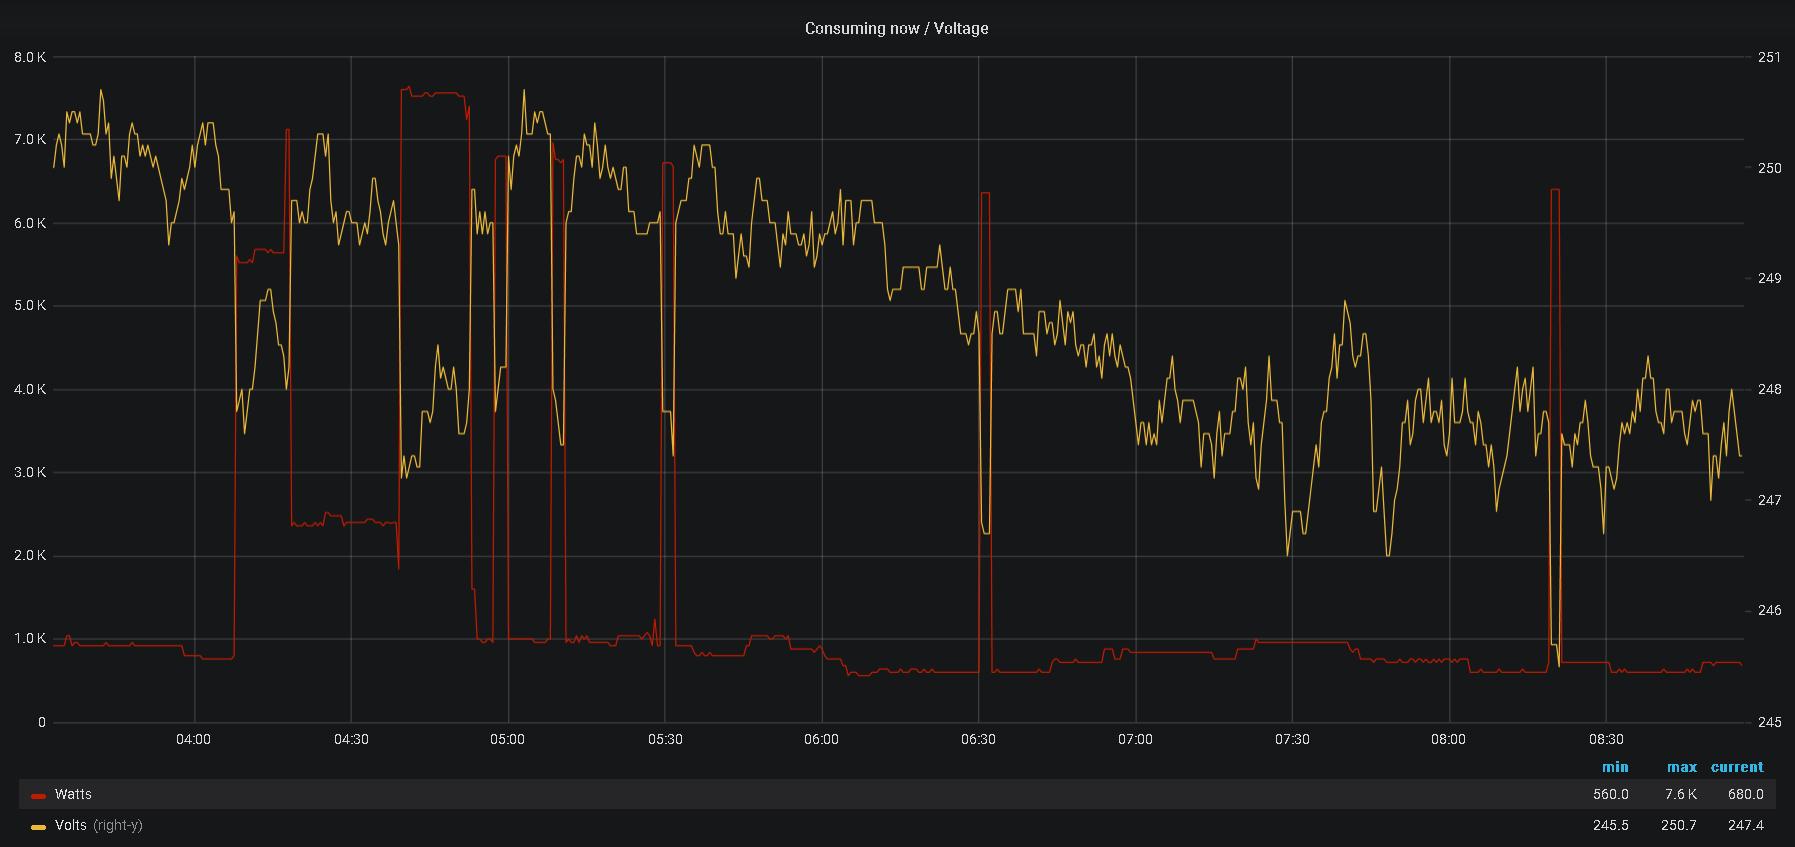 Hot water tank temperature monitoring - Hardware - Community